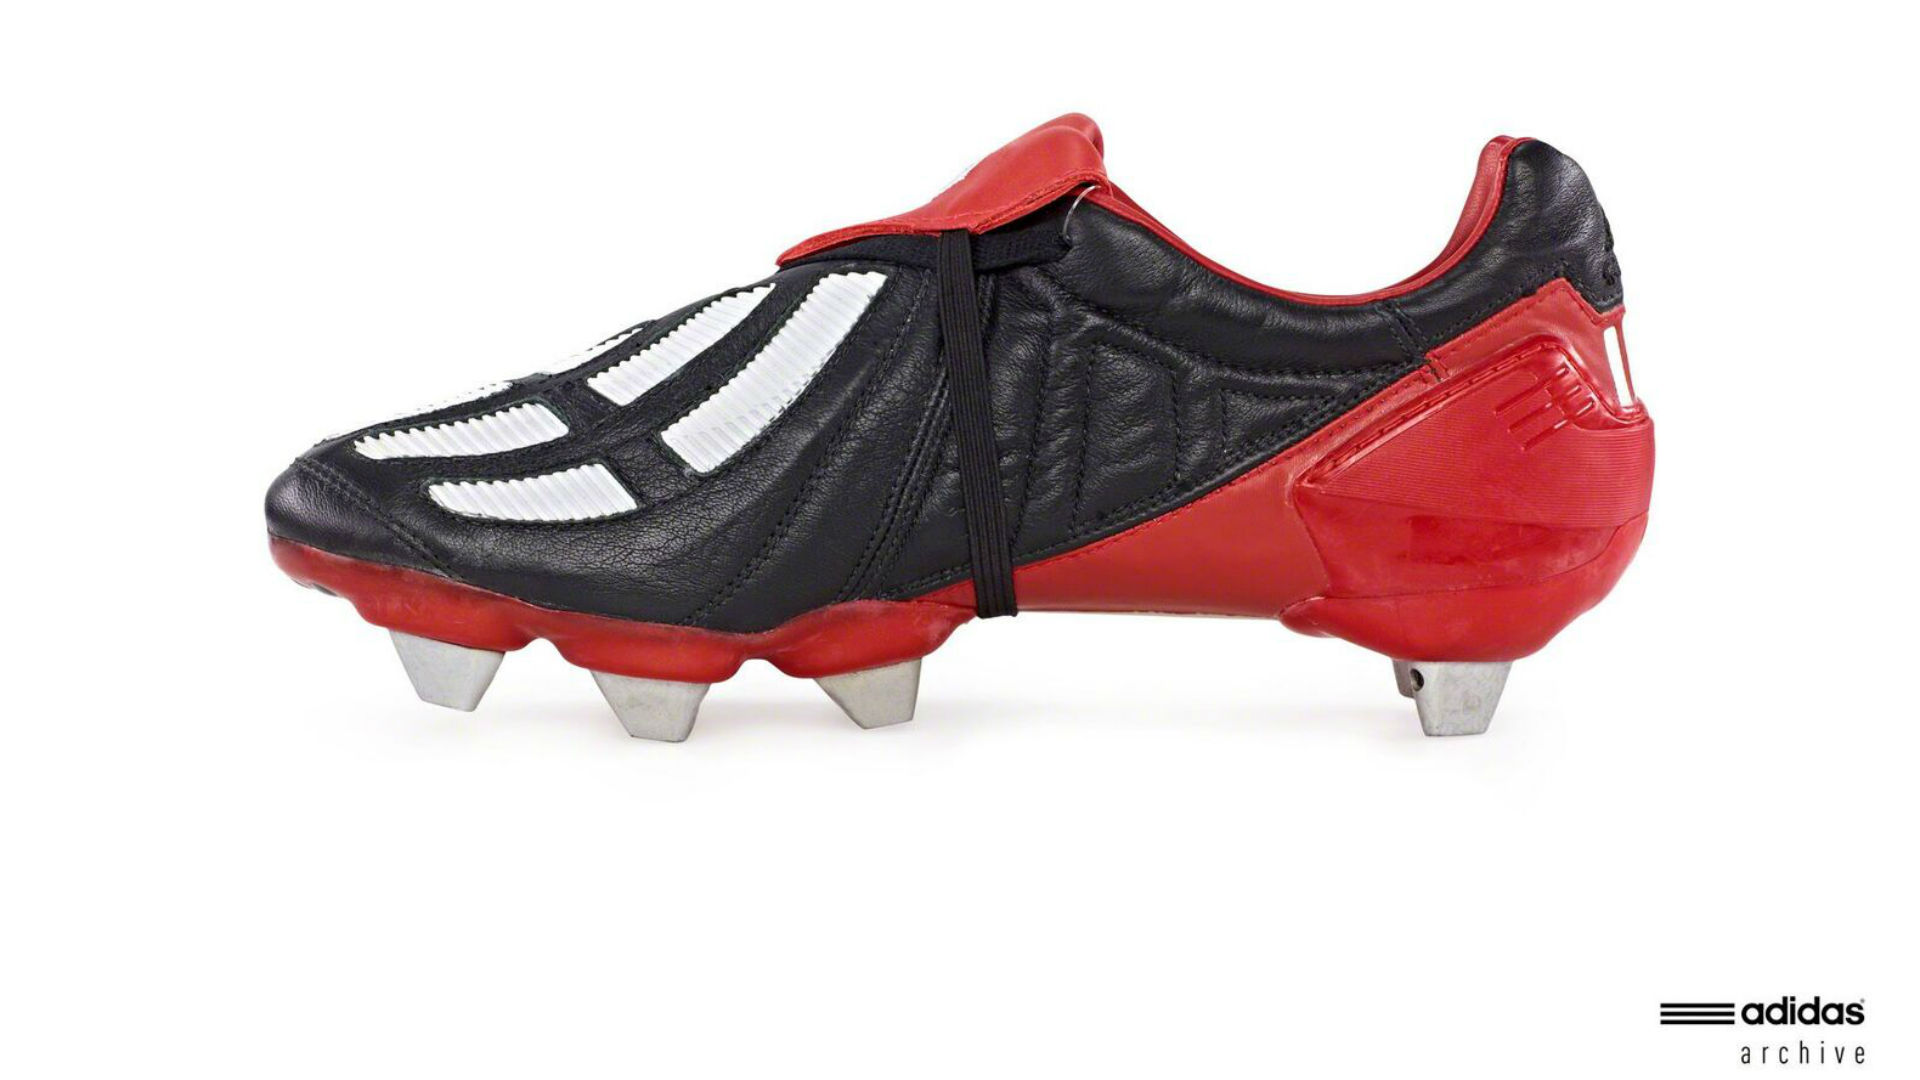 new zealand adidas predator traxion precio 94b56 ac9f7